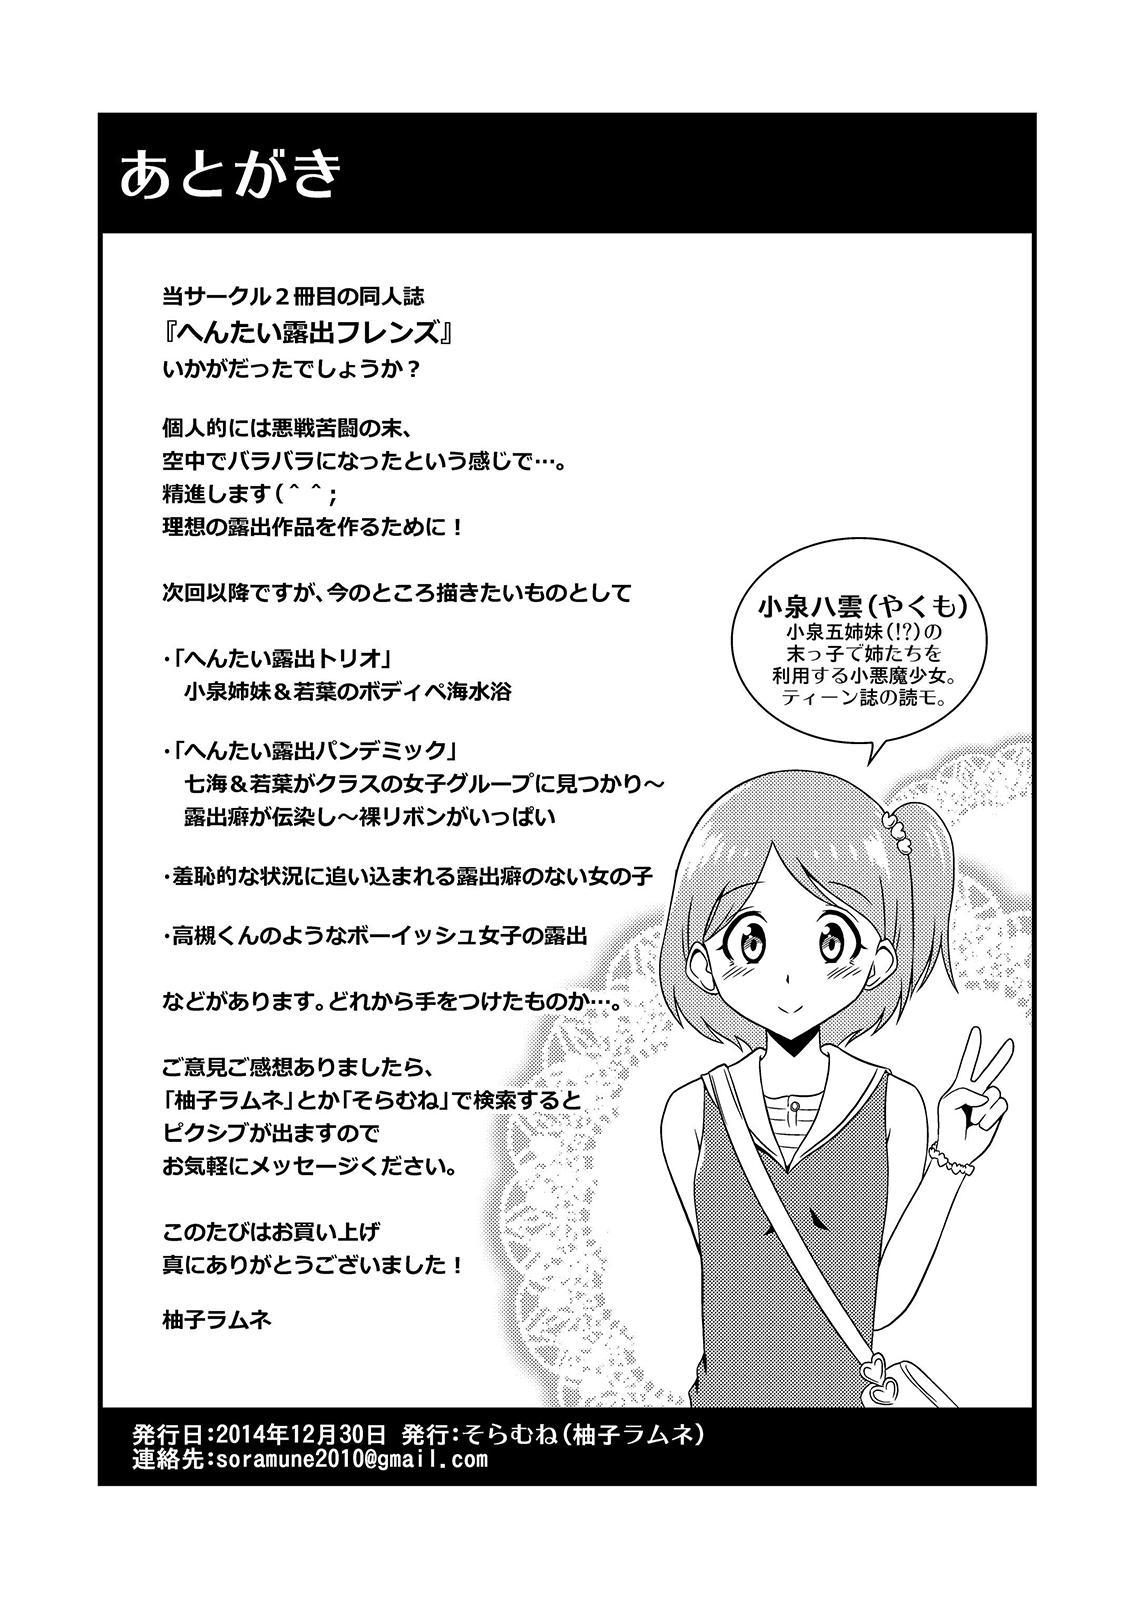 Hentai Roshutsu Friends - Abnormal Naked Friends 33